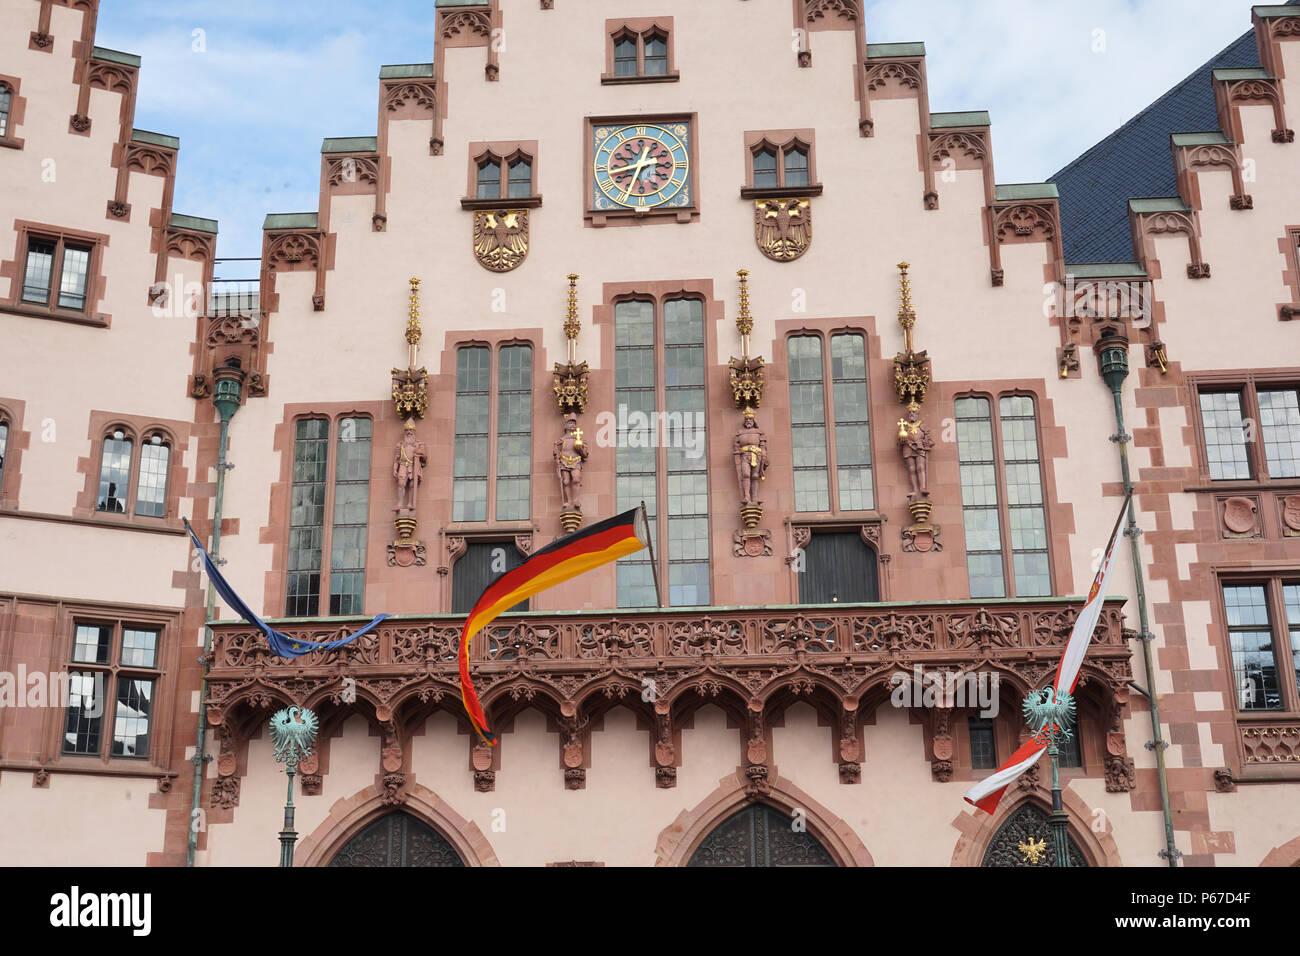 Fassade, Rathaus, Römer, Römerberg, Old Town, Historic Center, Frankfurt am Main, Germany Stock Photo